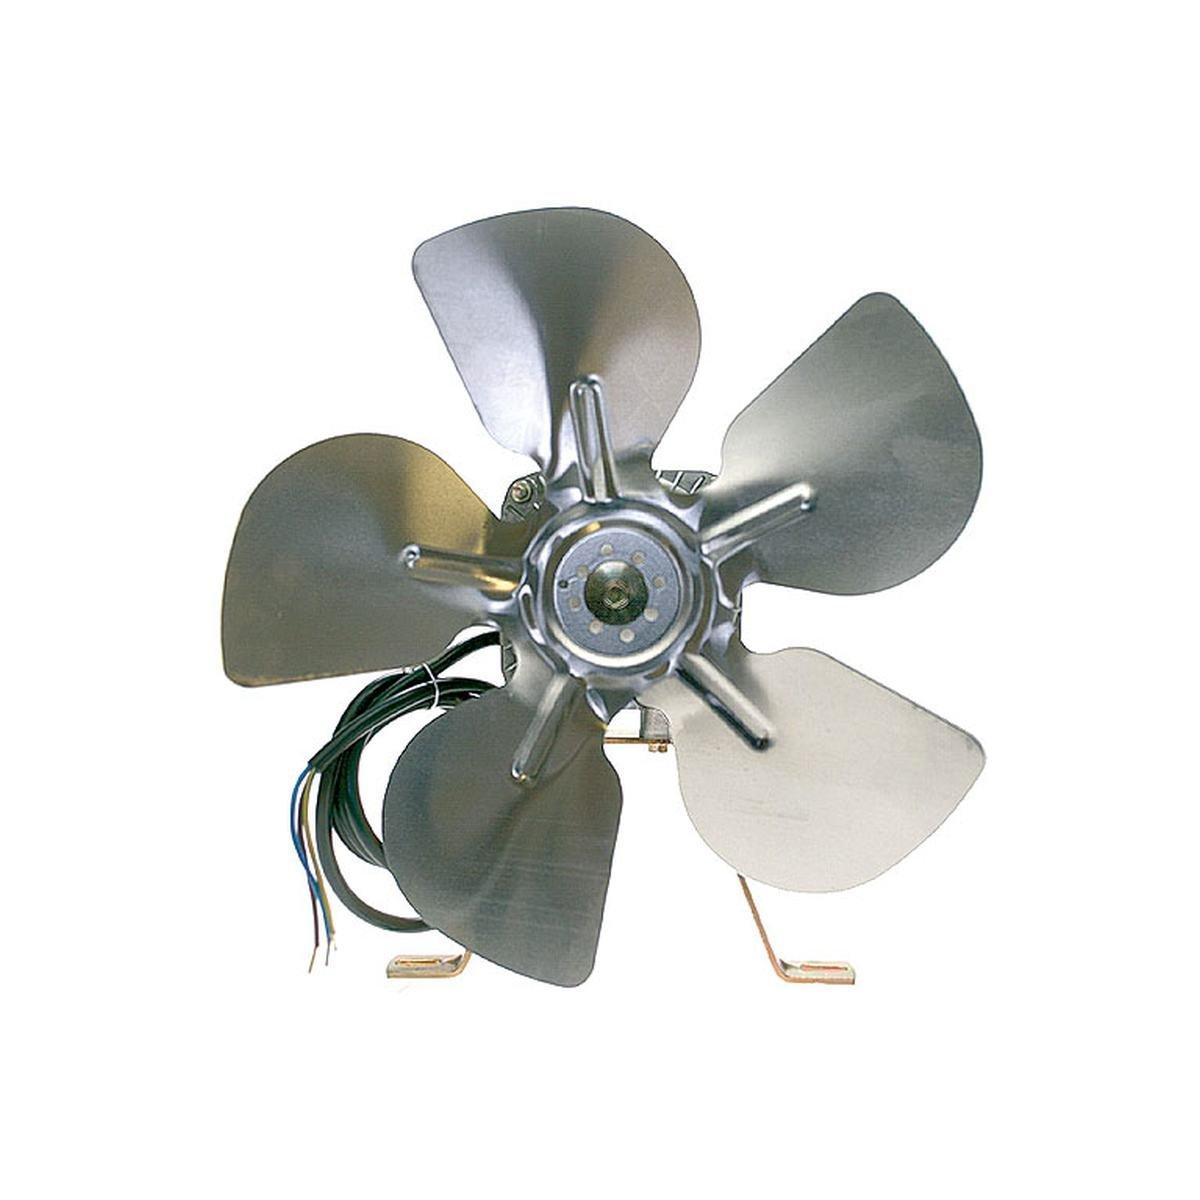 Ventilator 10W med vingediameter 255 mm. - Elco